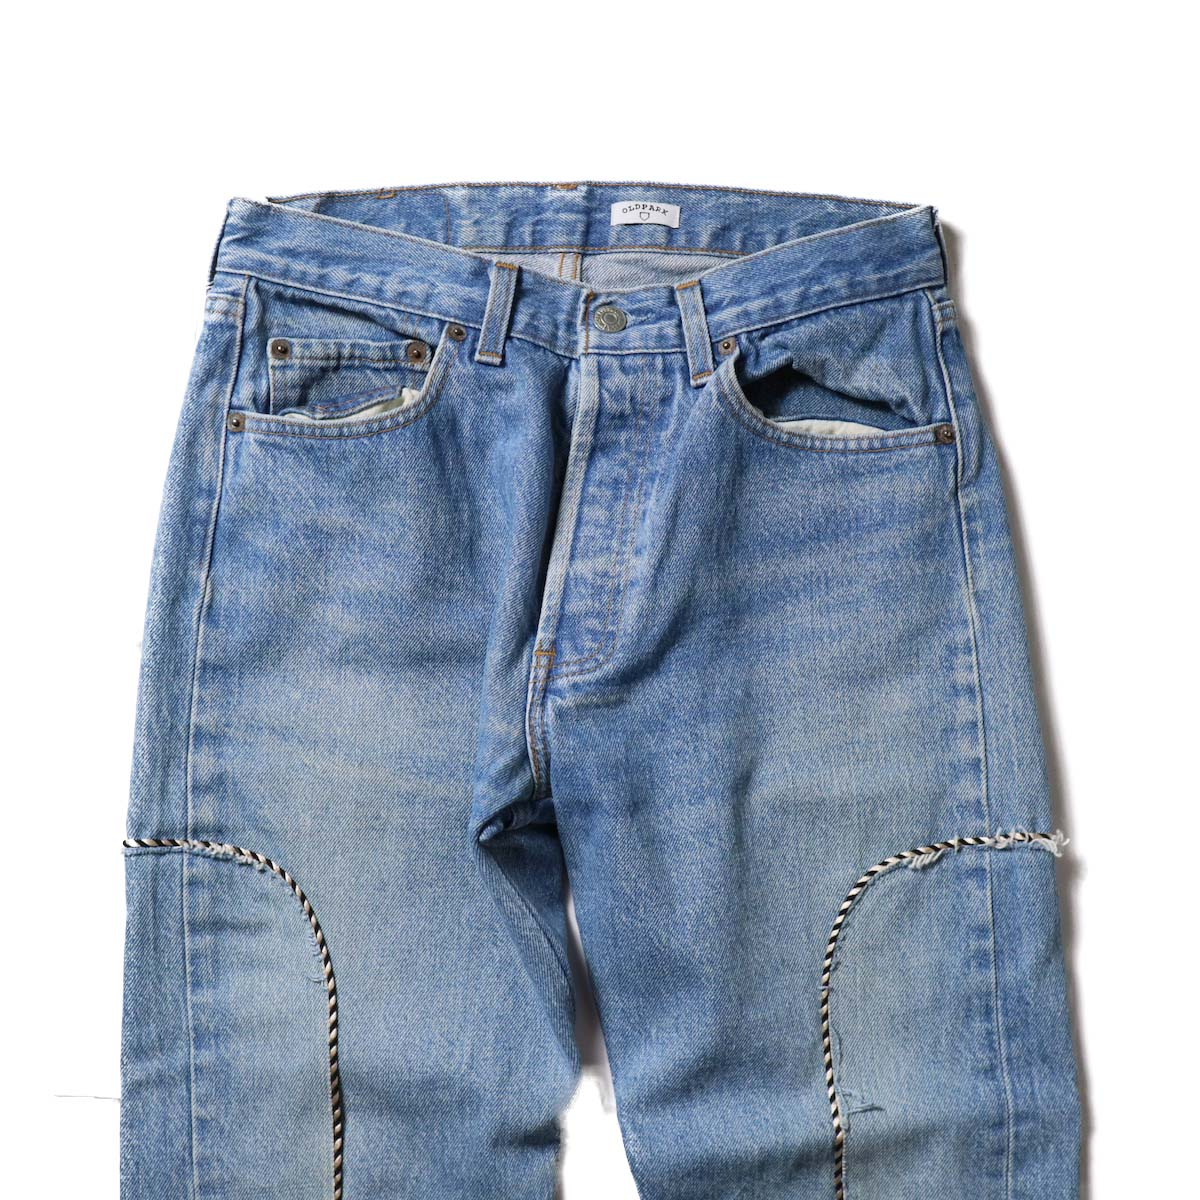 OLD PARK / Western Jeans Blue (Ssize-D)ウエスト